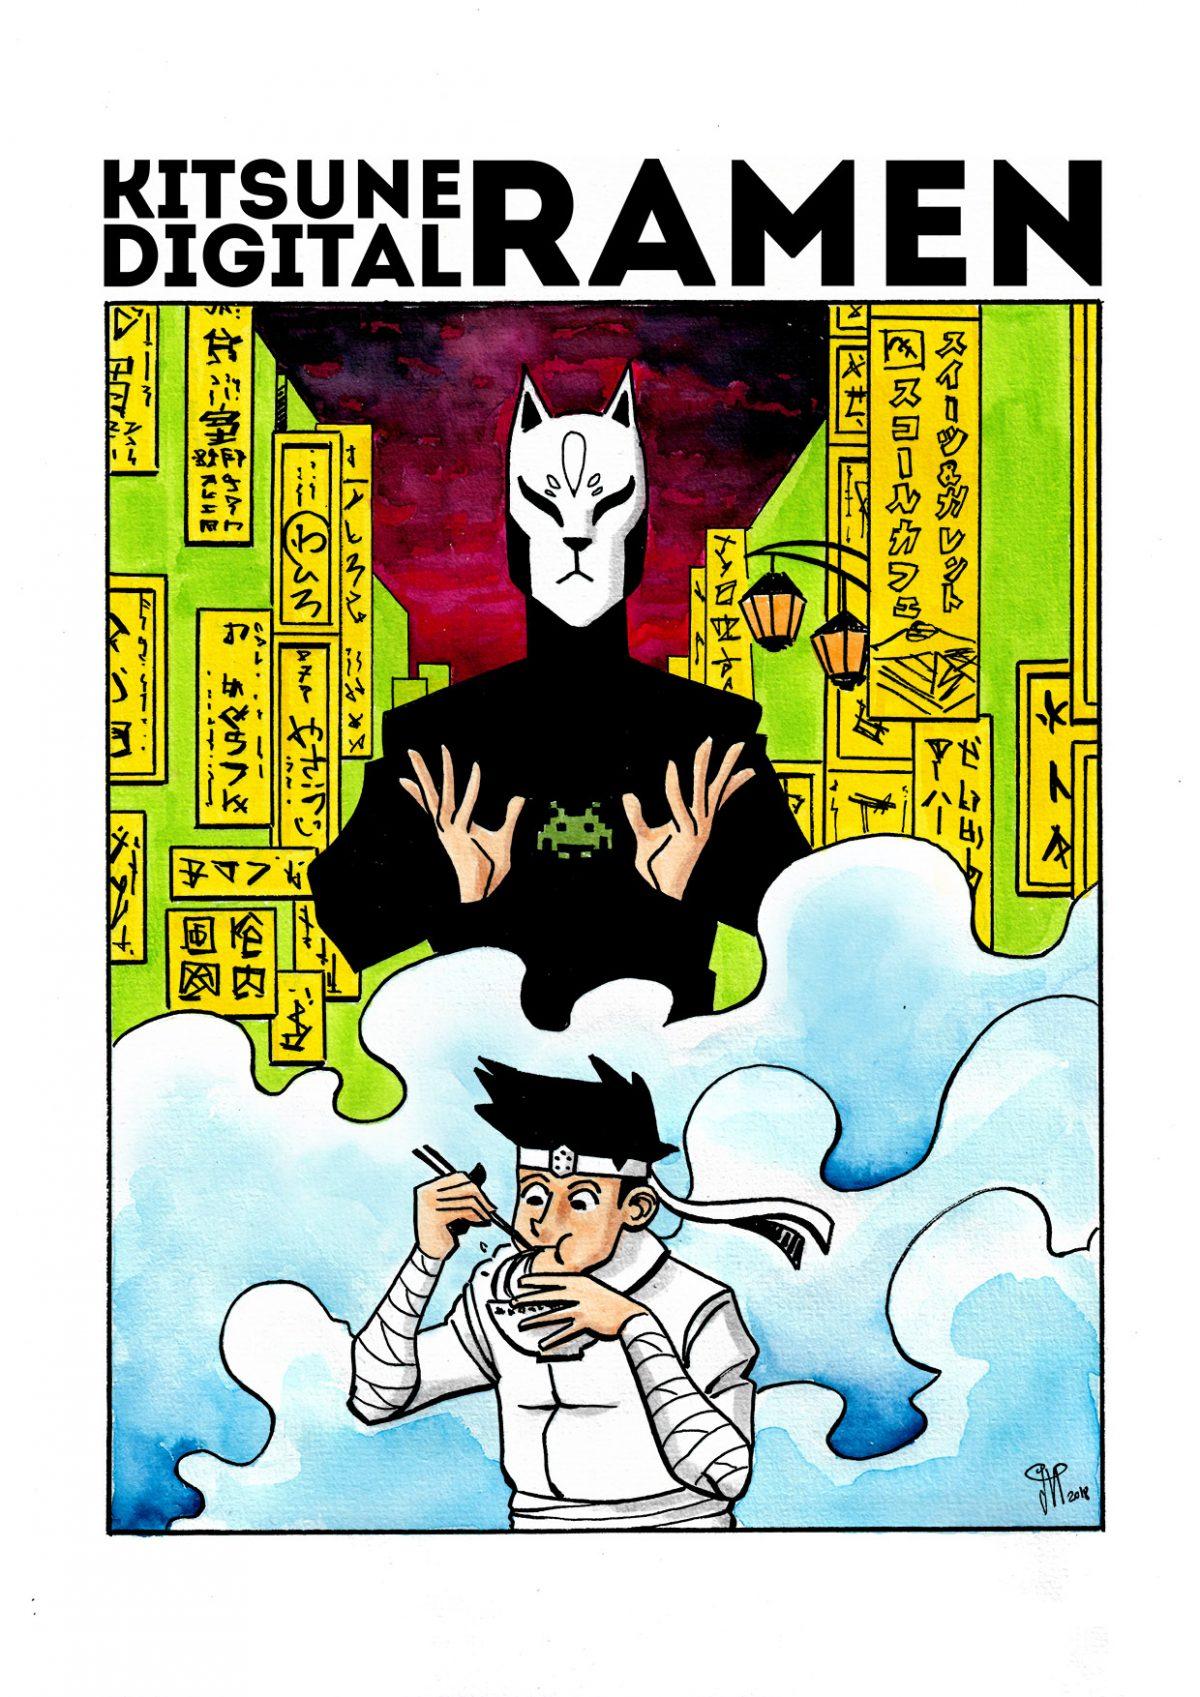 Komikero Invisible Kitsune Digital Ramen